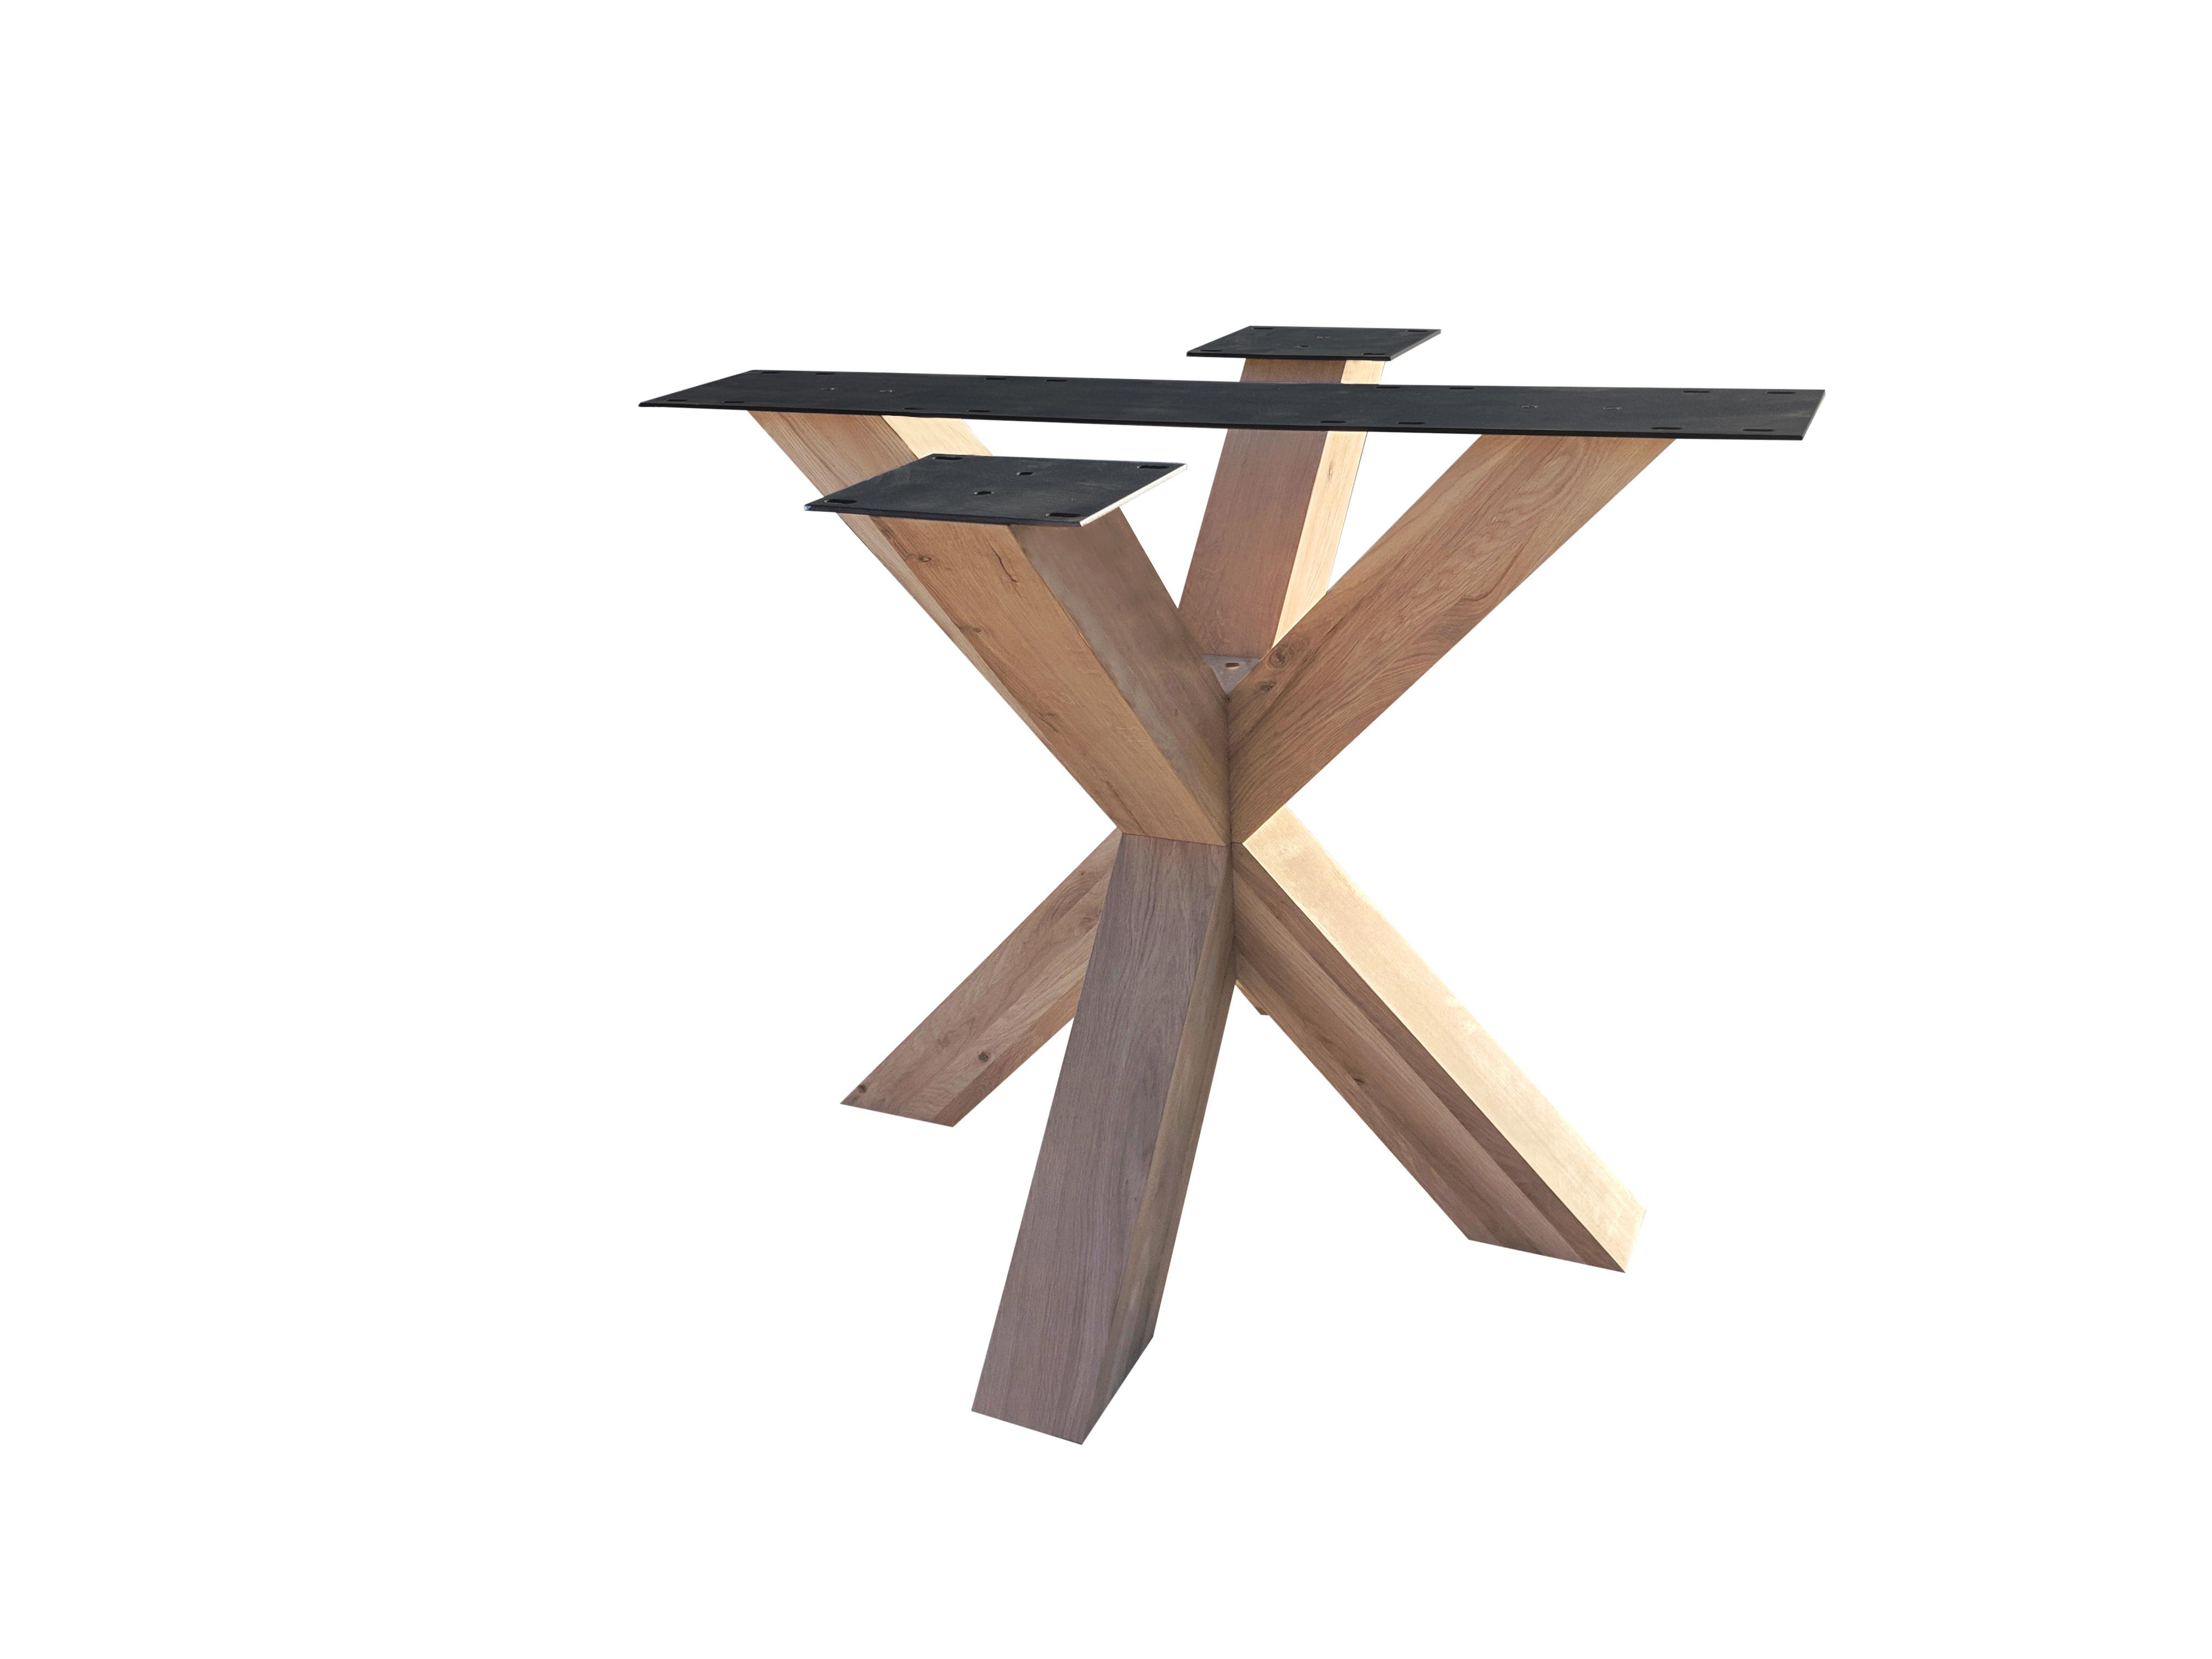 Eiken dubbele kruispoot 10x10 cm - 72 cm hoog - 90x90 cm -  Rustiek licht geborsteld - Dubbele X tafelpoot - 12% kd Europees eikenhout